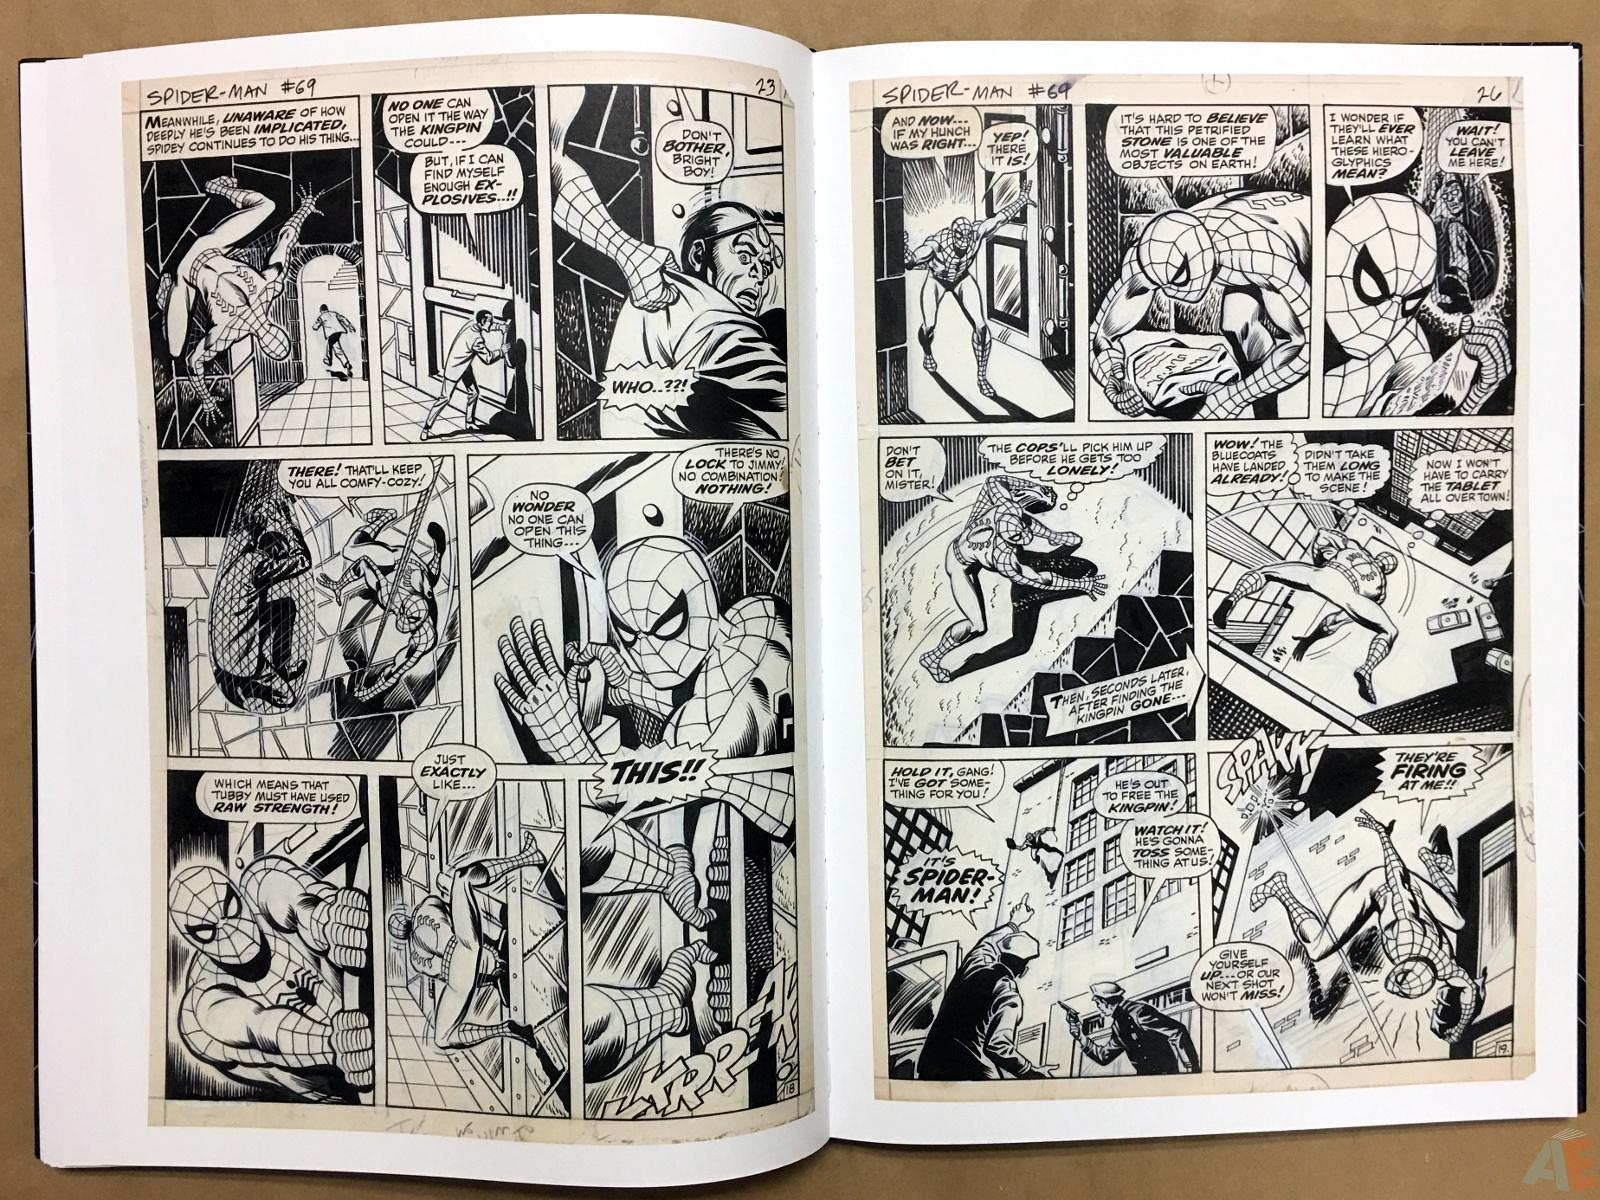 John Romita's The Amazing Spider-Man Artist's Edition 24